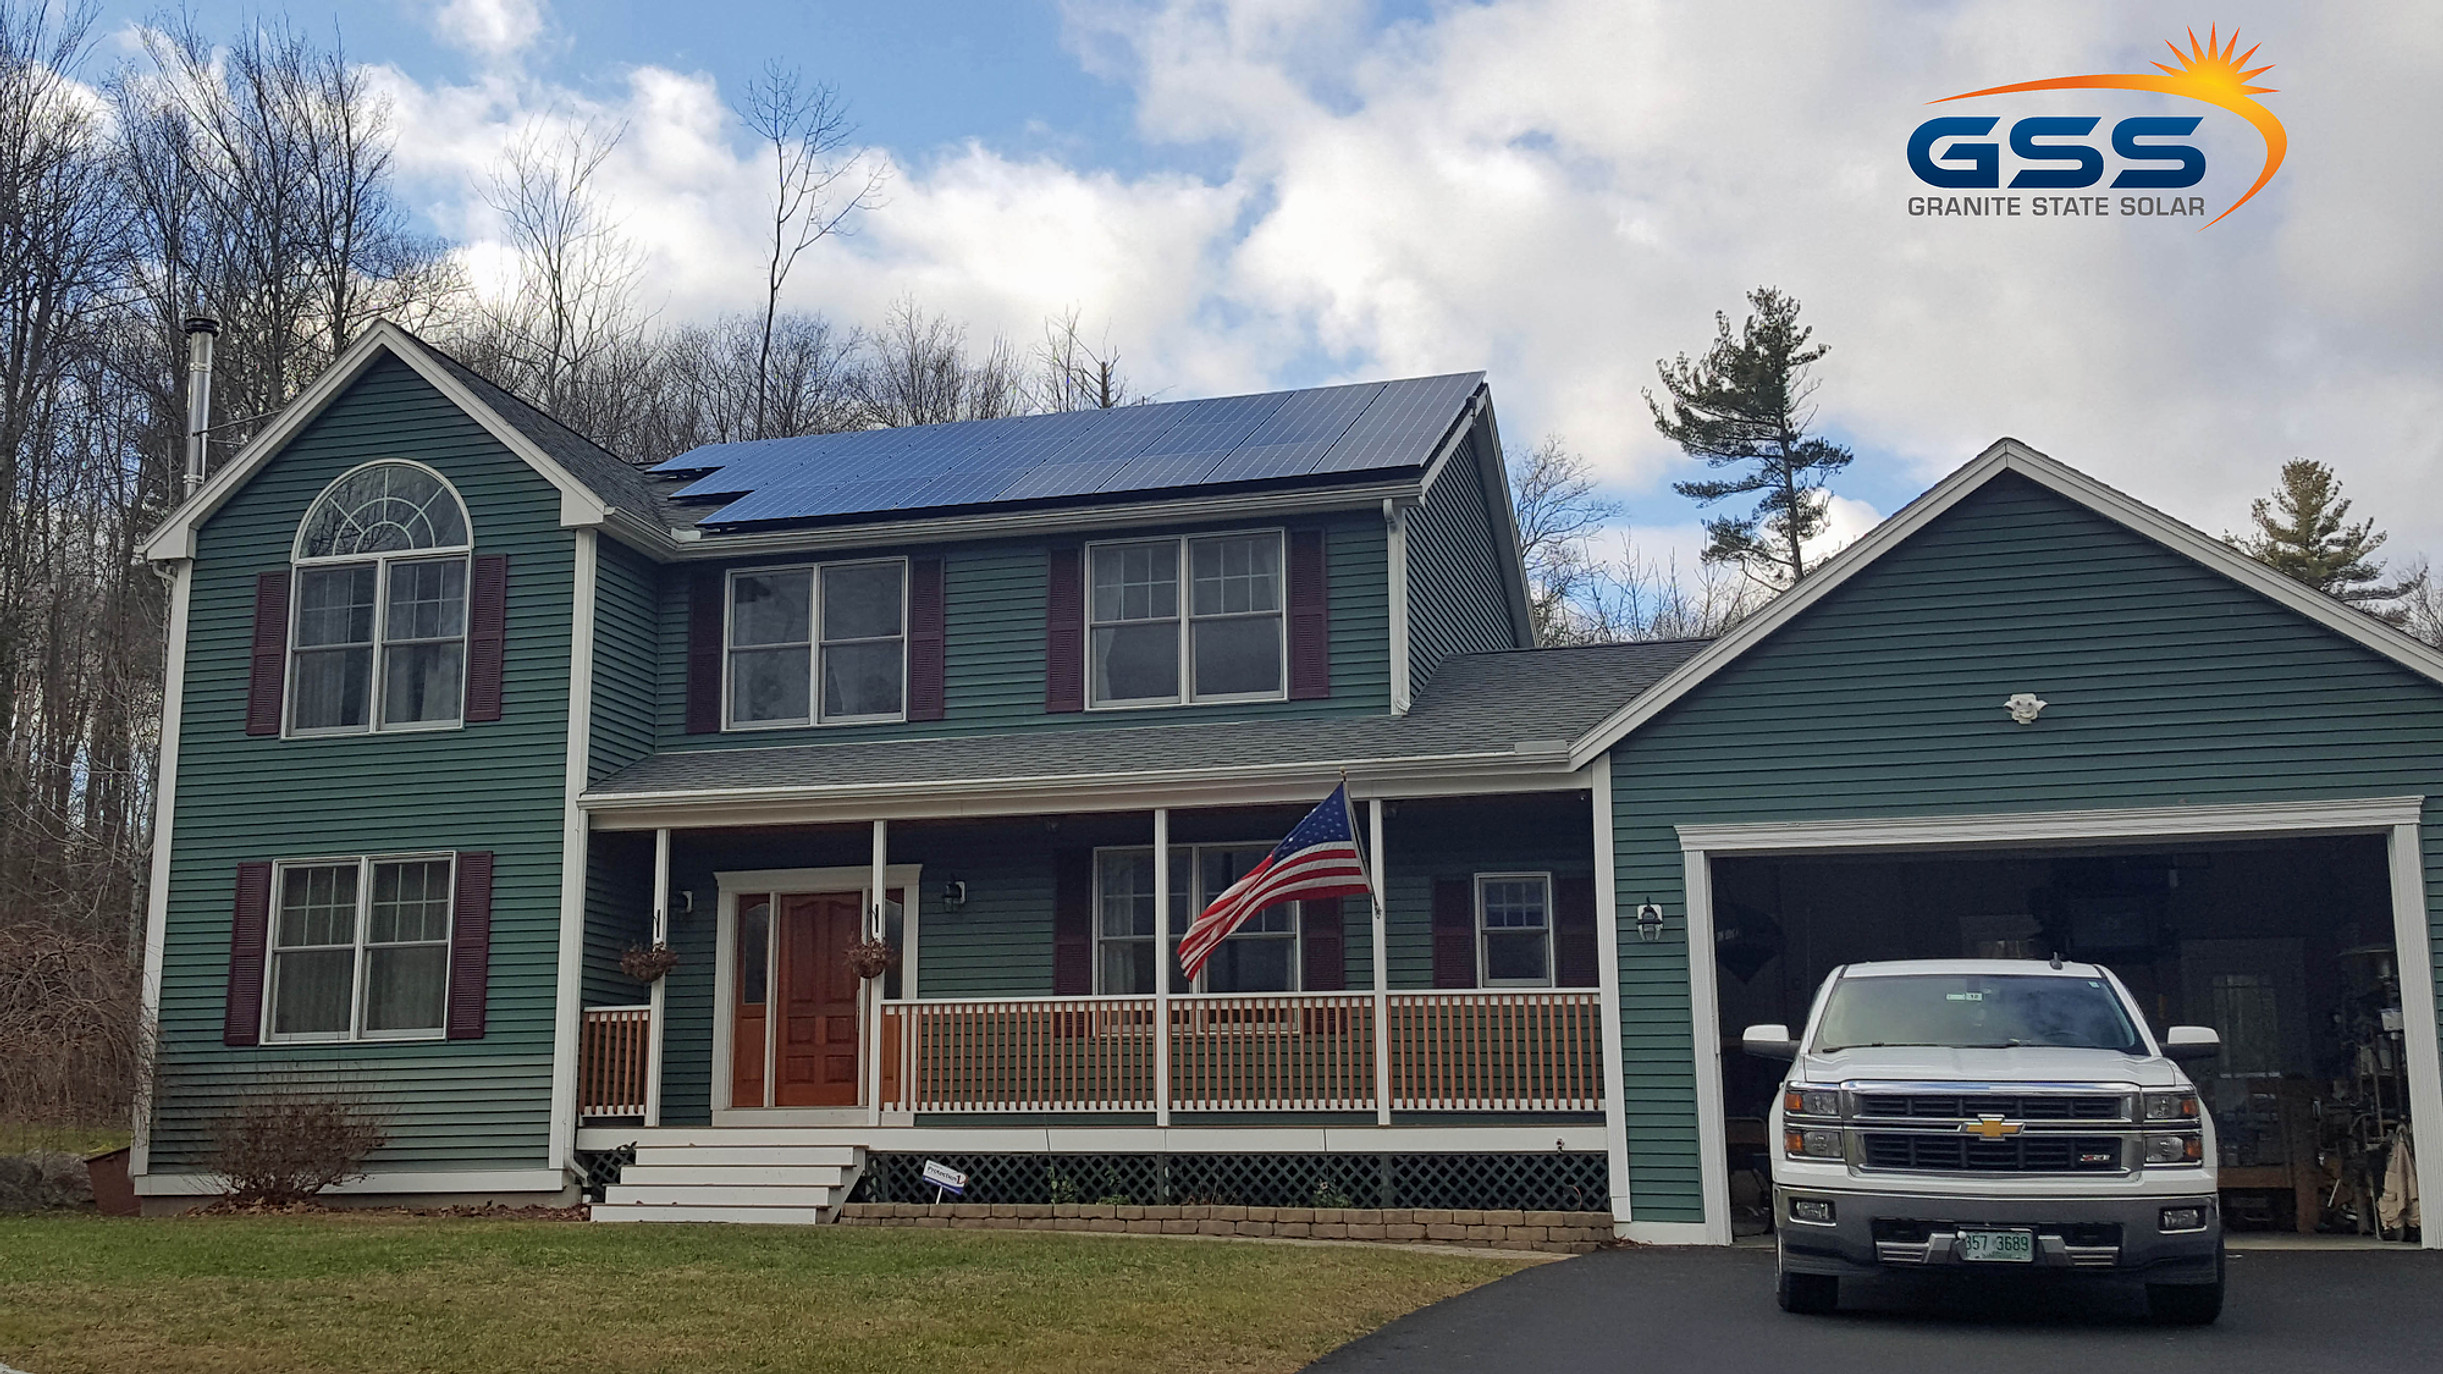 24 solar panel roof array